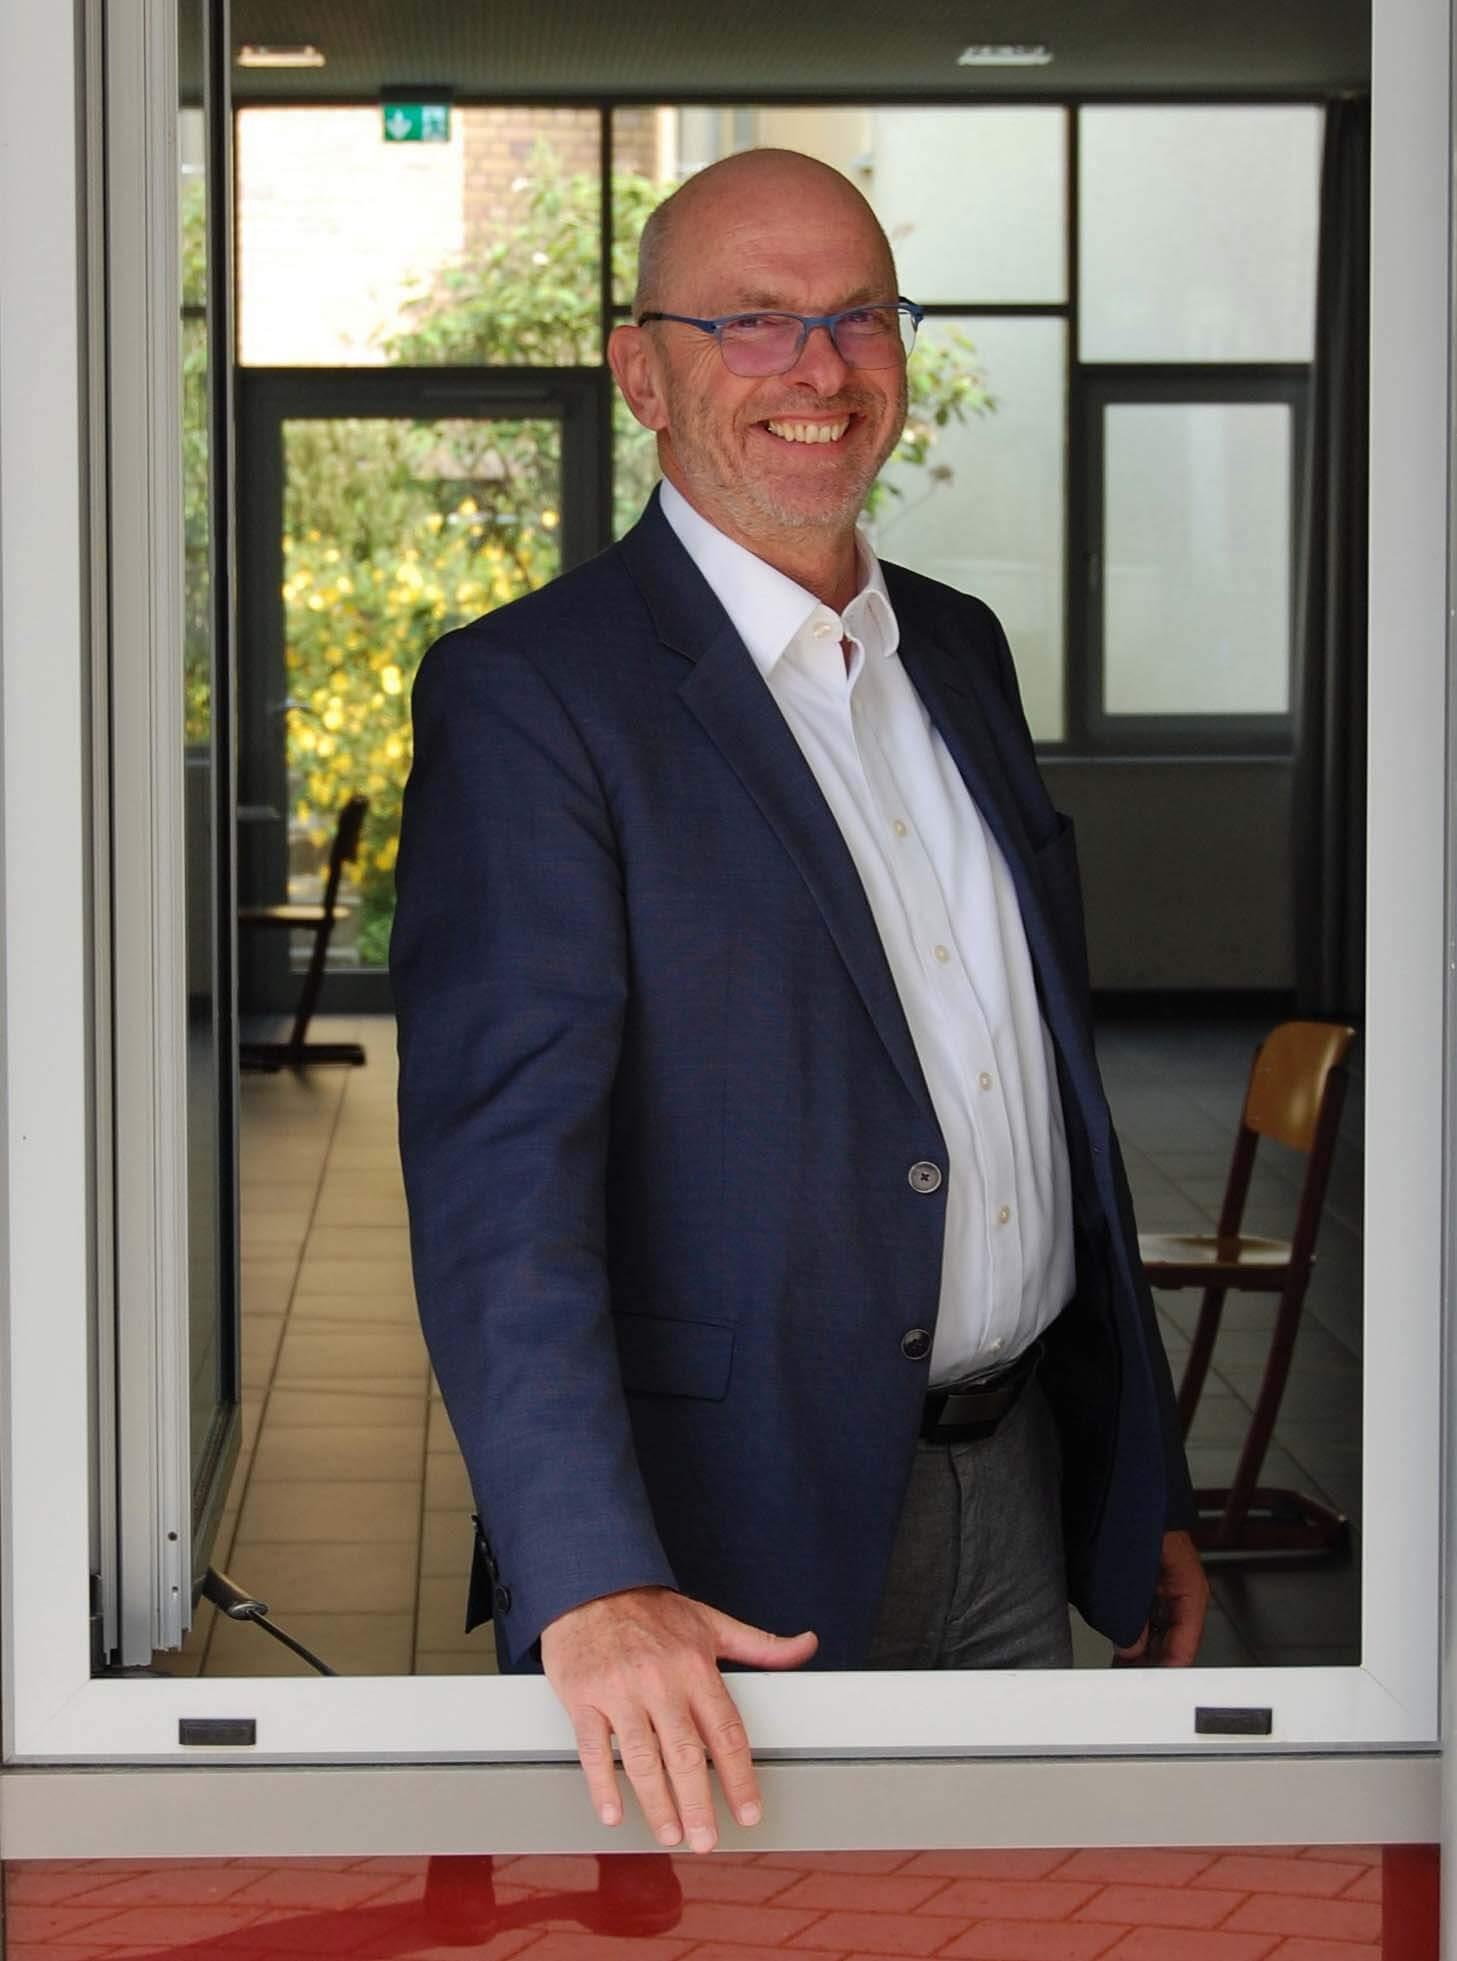 Gymnasium Hersbruck - Direktor Klaus Neunheoffer